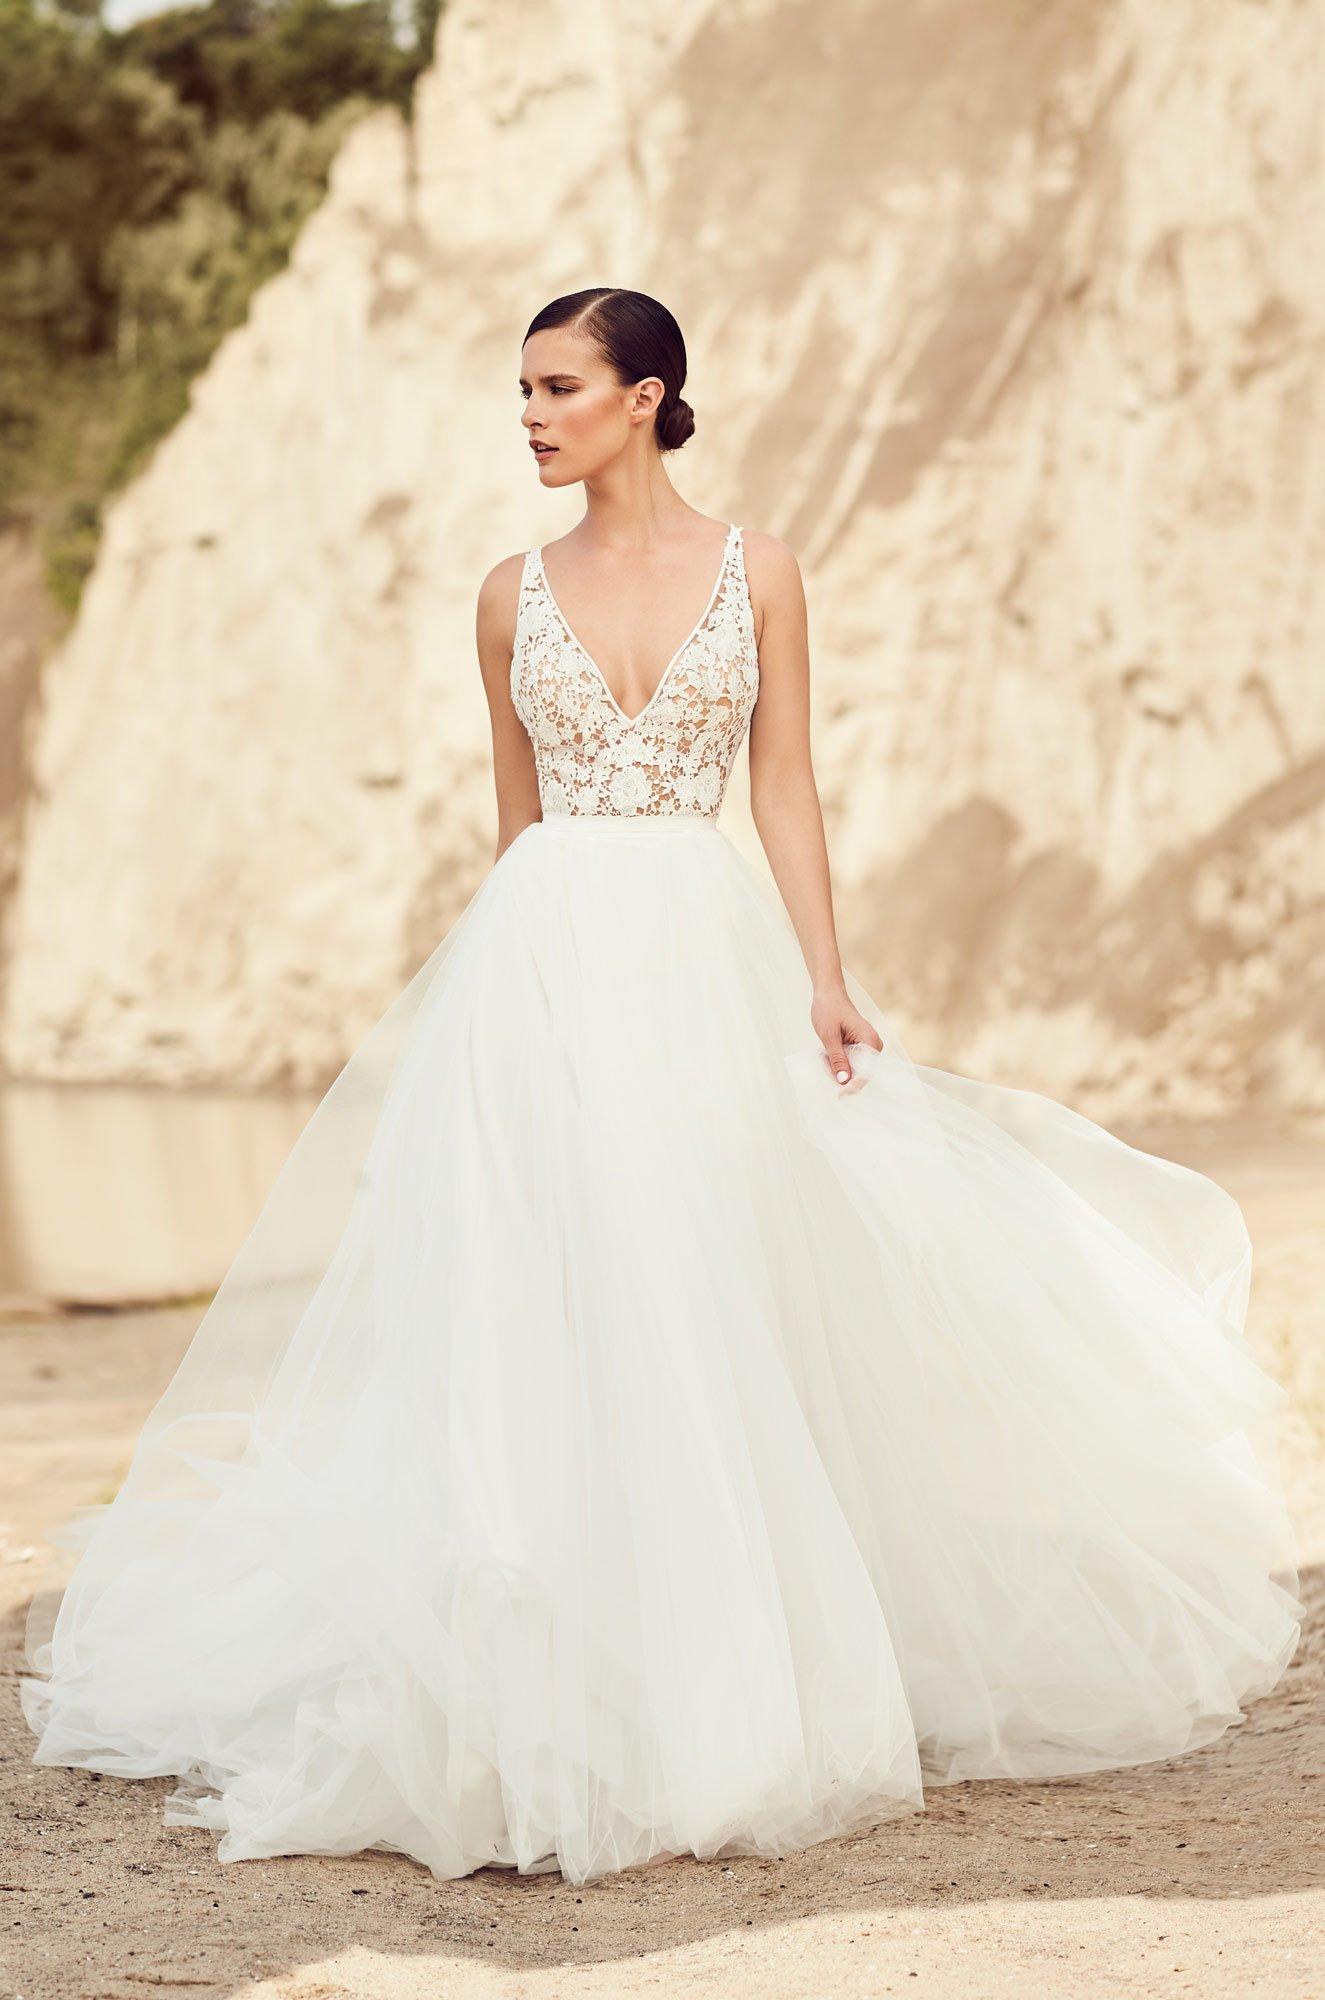 Flowing Tulle Wedding Dress  Style 2106  Mikaella Bridal